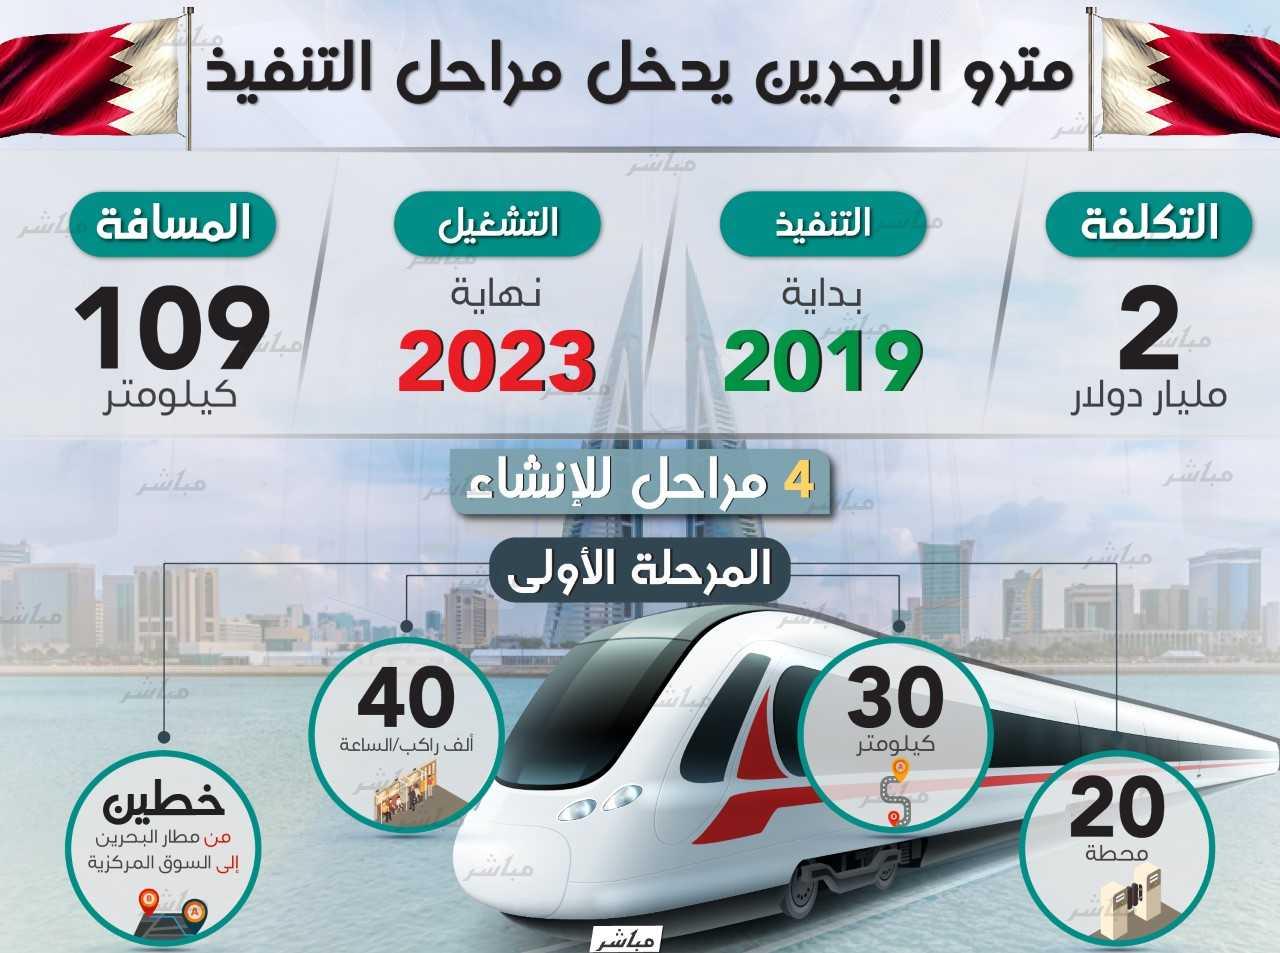 5ade944c3 إنفوجراف.. مترو البحرين الأول من نوعه في تاريخ المملكة - معلومات مباشر